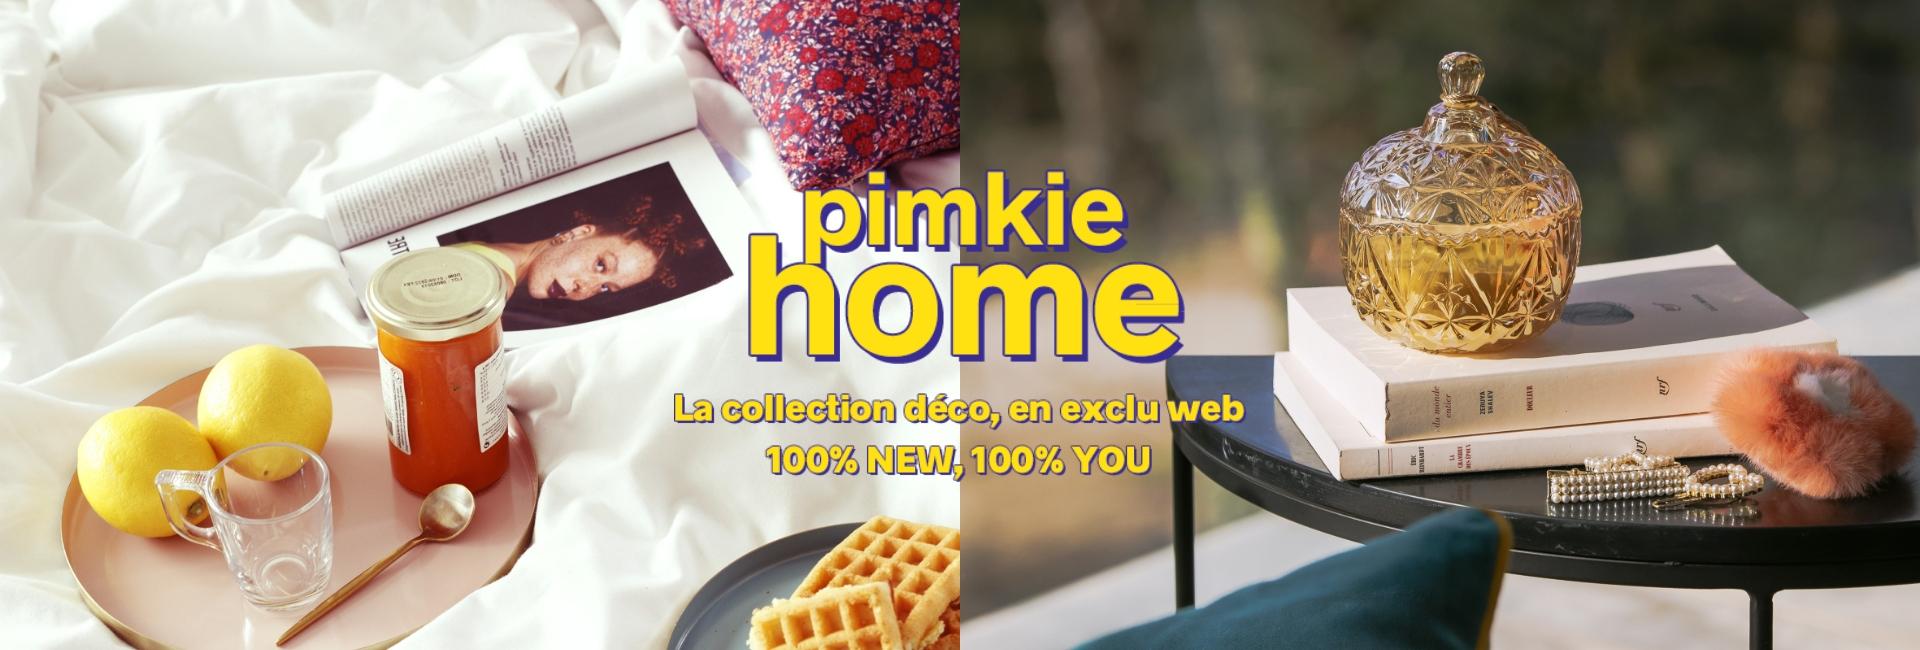 Pimkie Home - La collection déco, en exclu web 100% NEW, 100% YOU - Pimkie